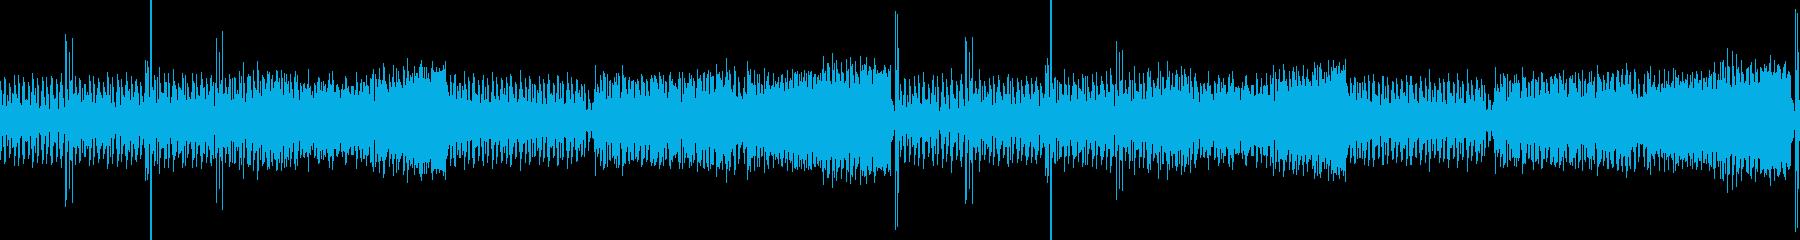 三味線尺八EDM・琴・日本風・和風・映像の再生済みの波形